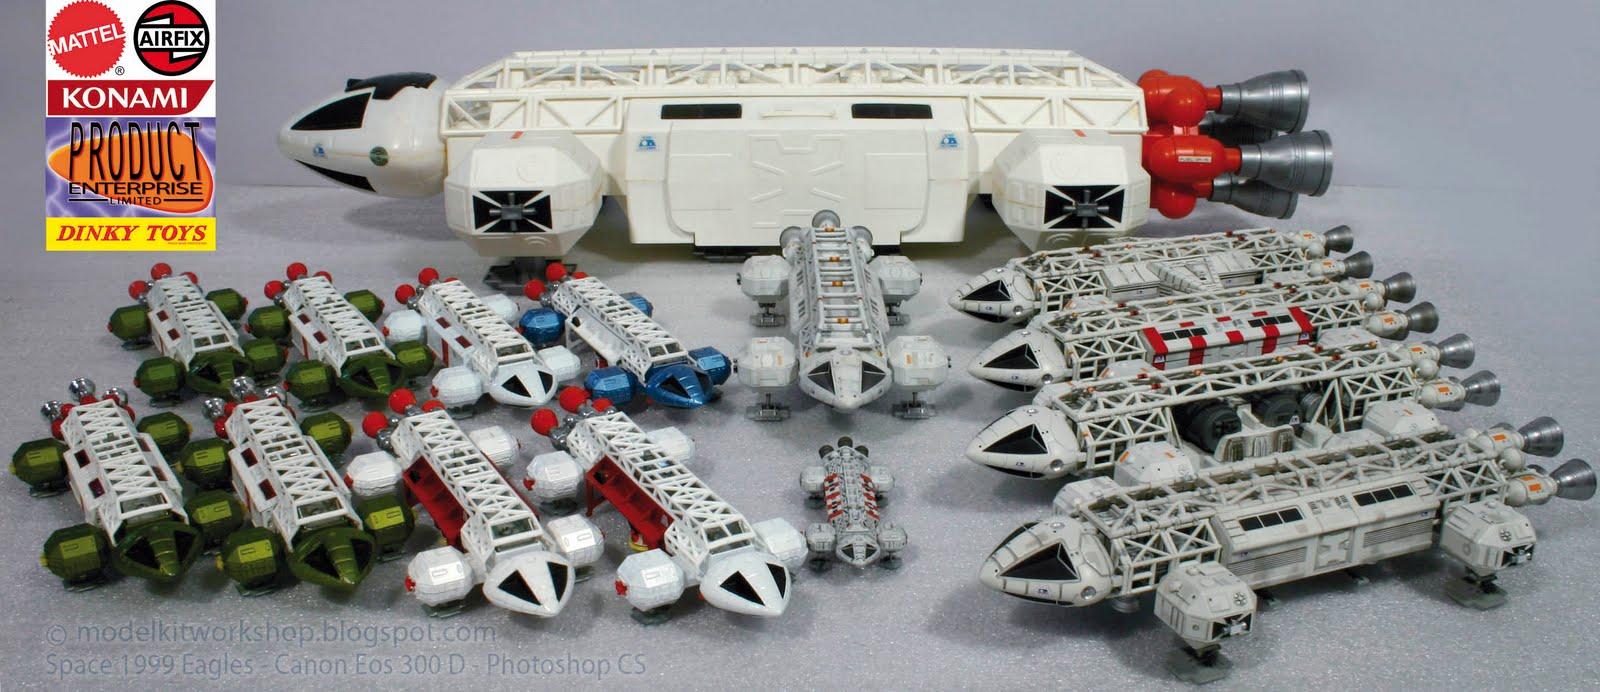 space 1999 spacecraft designs - photo #7